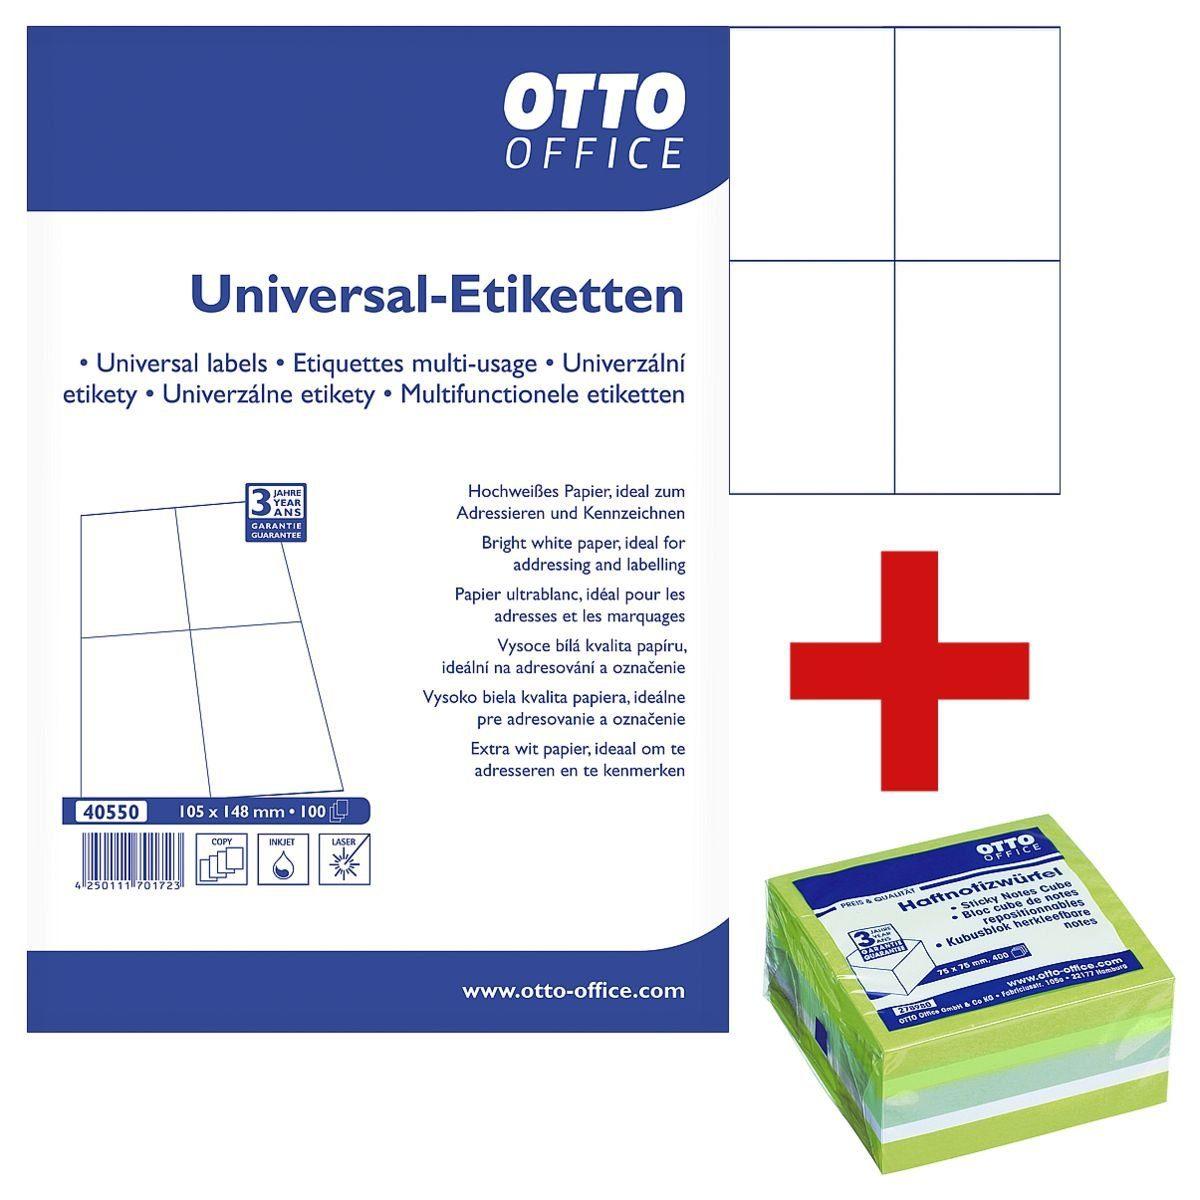 OTTO Office Standard 400er-Pack Universal Klebeetiketten inkl. Haftnotizwürfel 1 Set